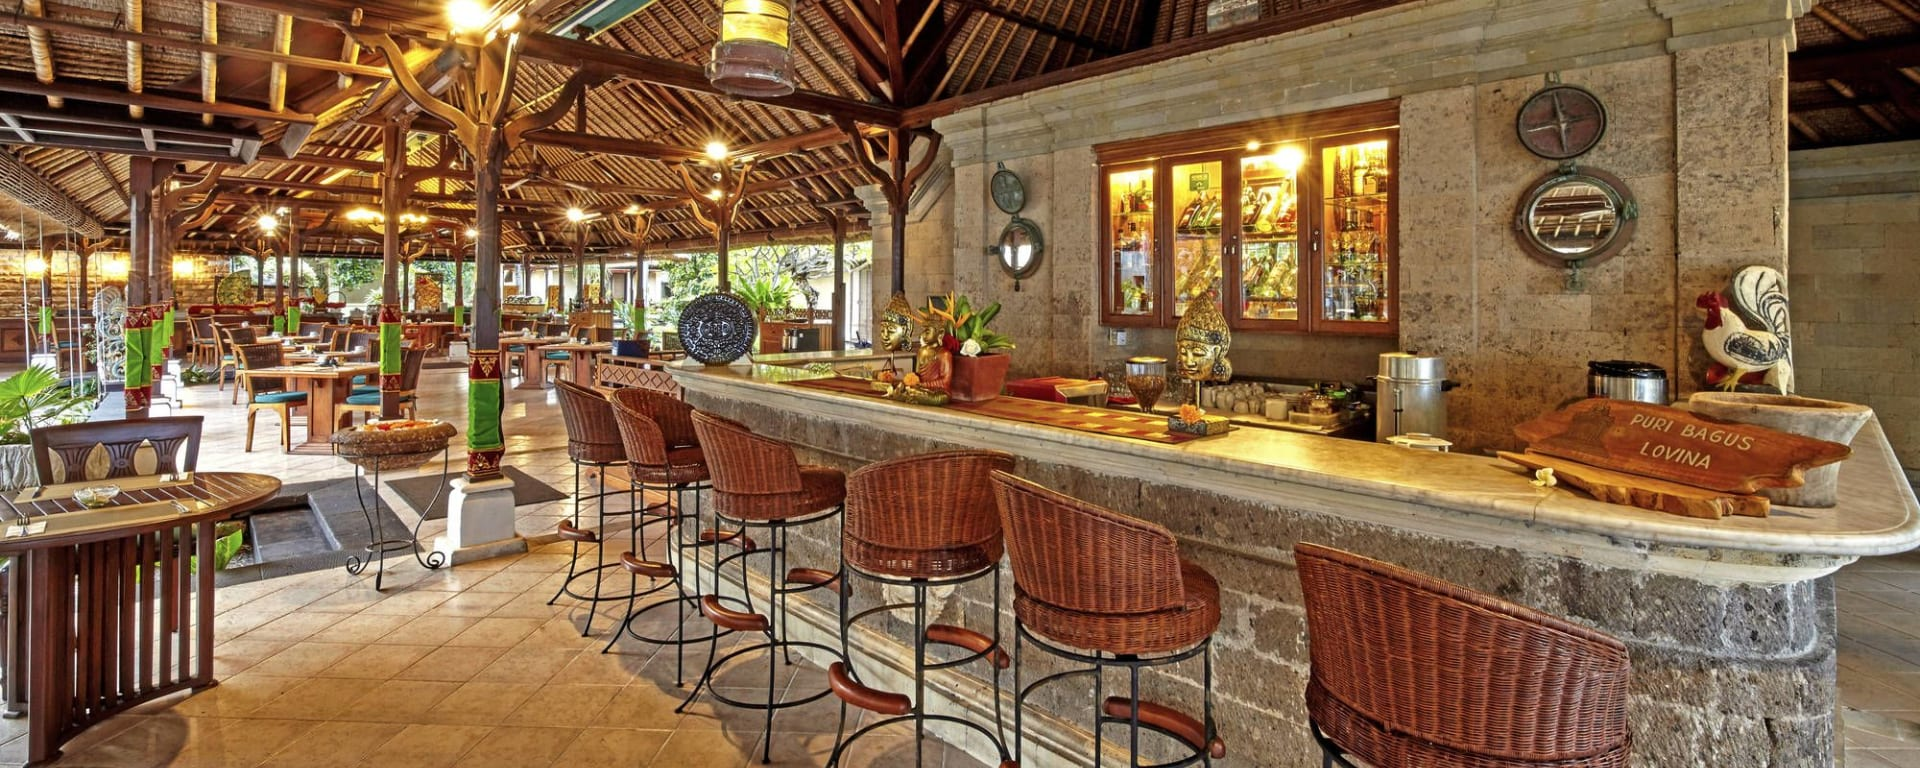 Puri Bagus Lovina à Nord de Bali: Saraswati Restaurant & Bar